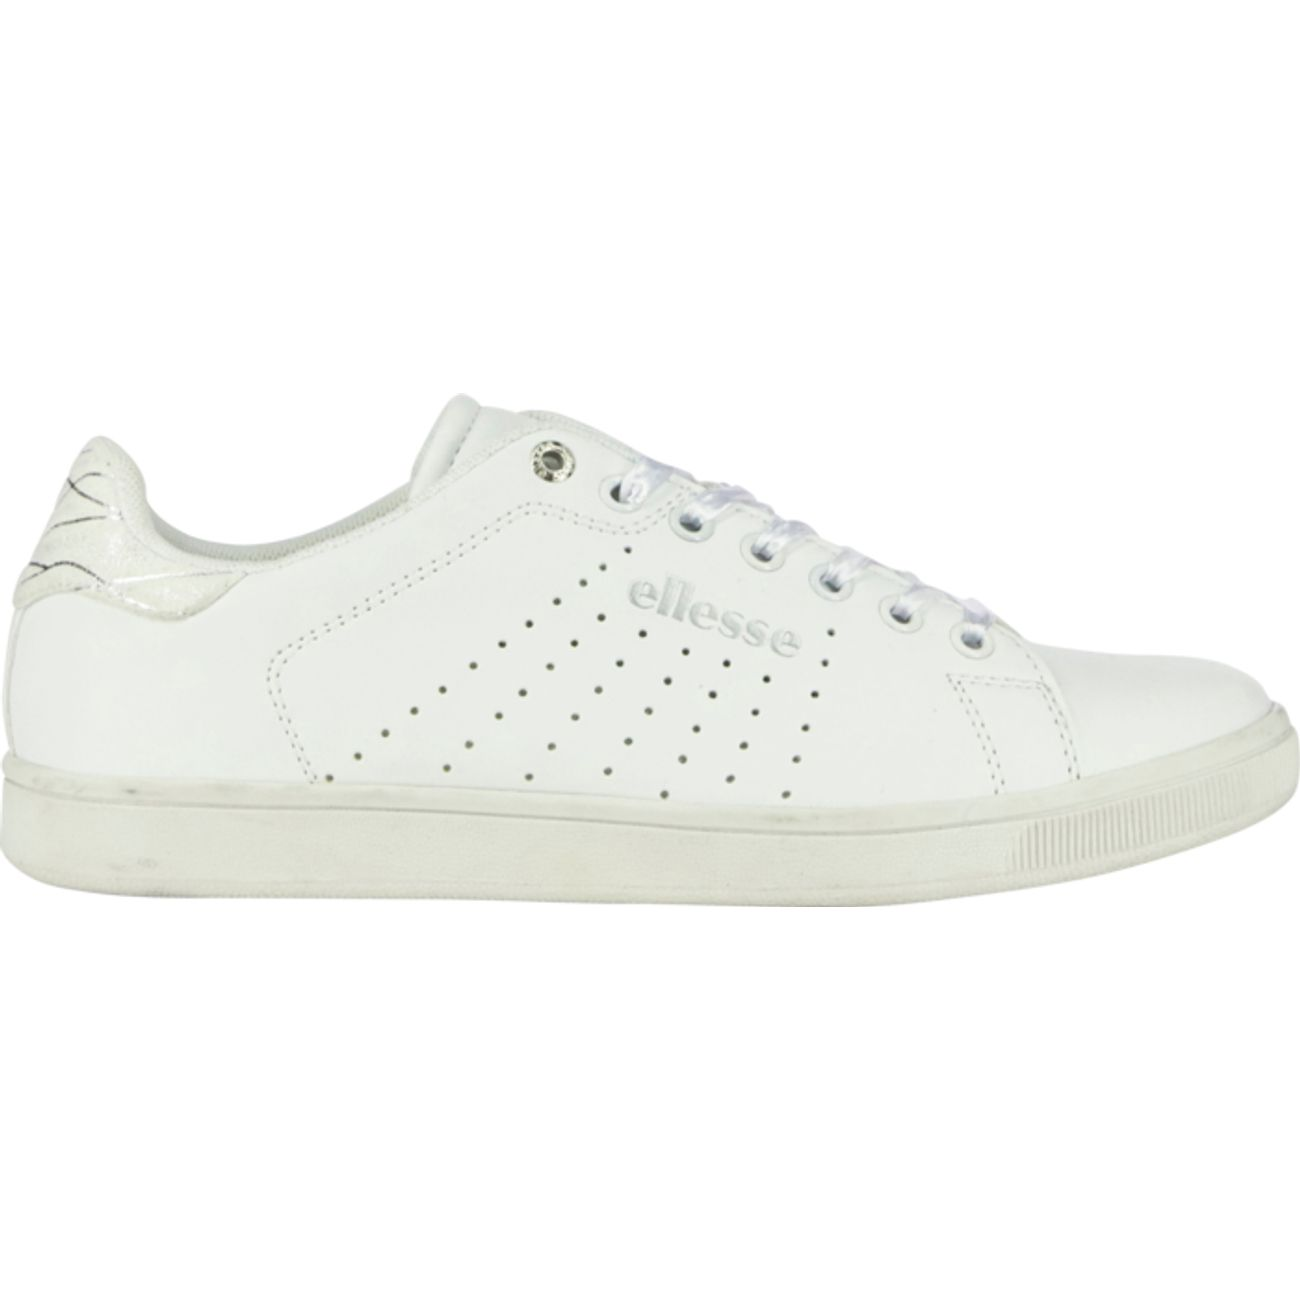 finest selection a8180 62ecd BARCELON Sneakers   Tennis basses femme.